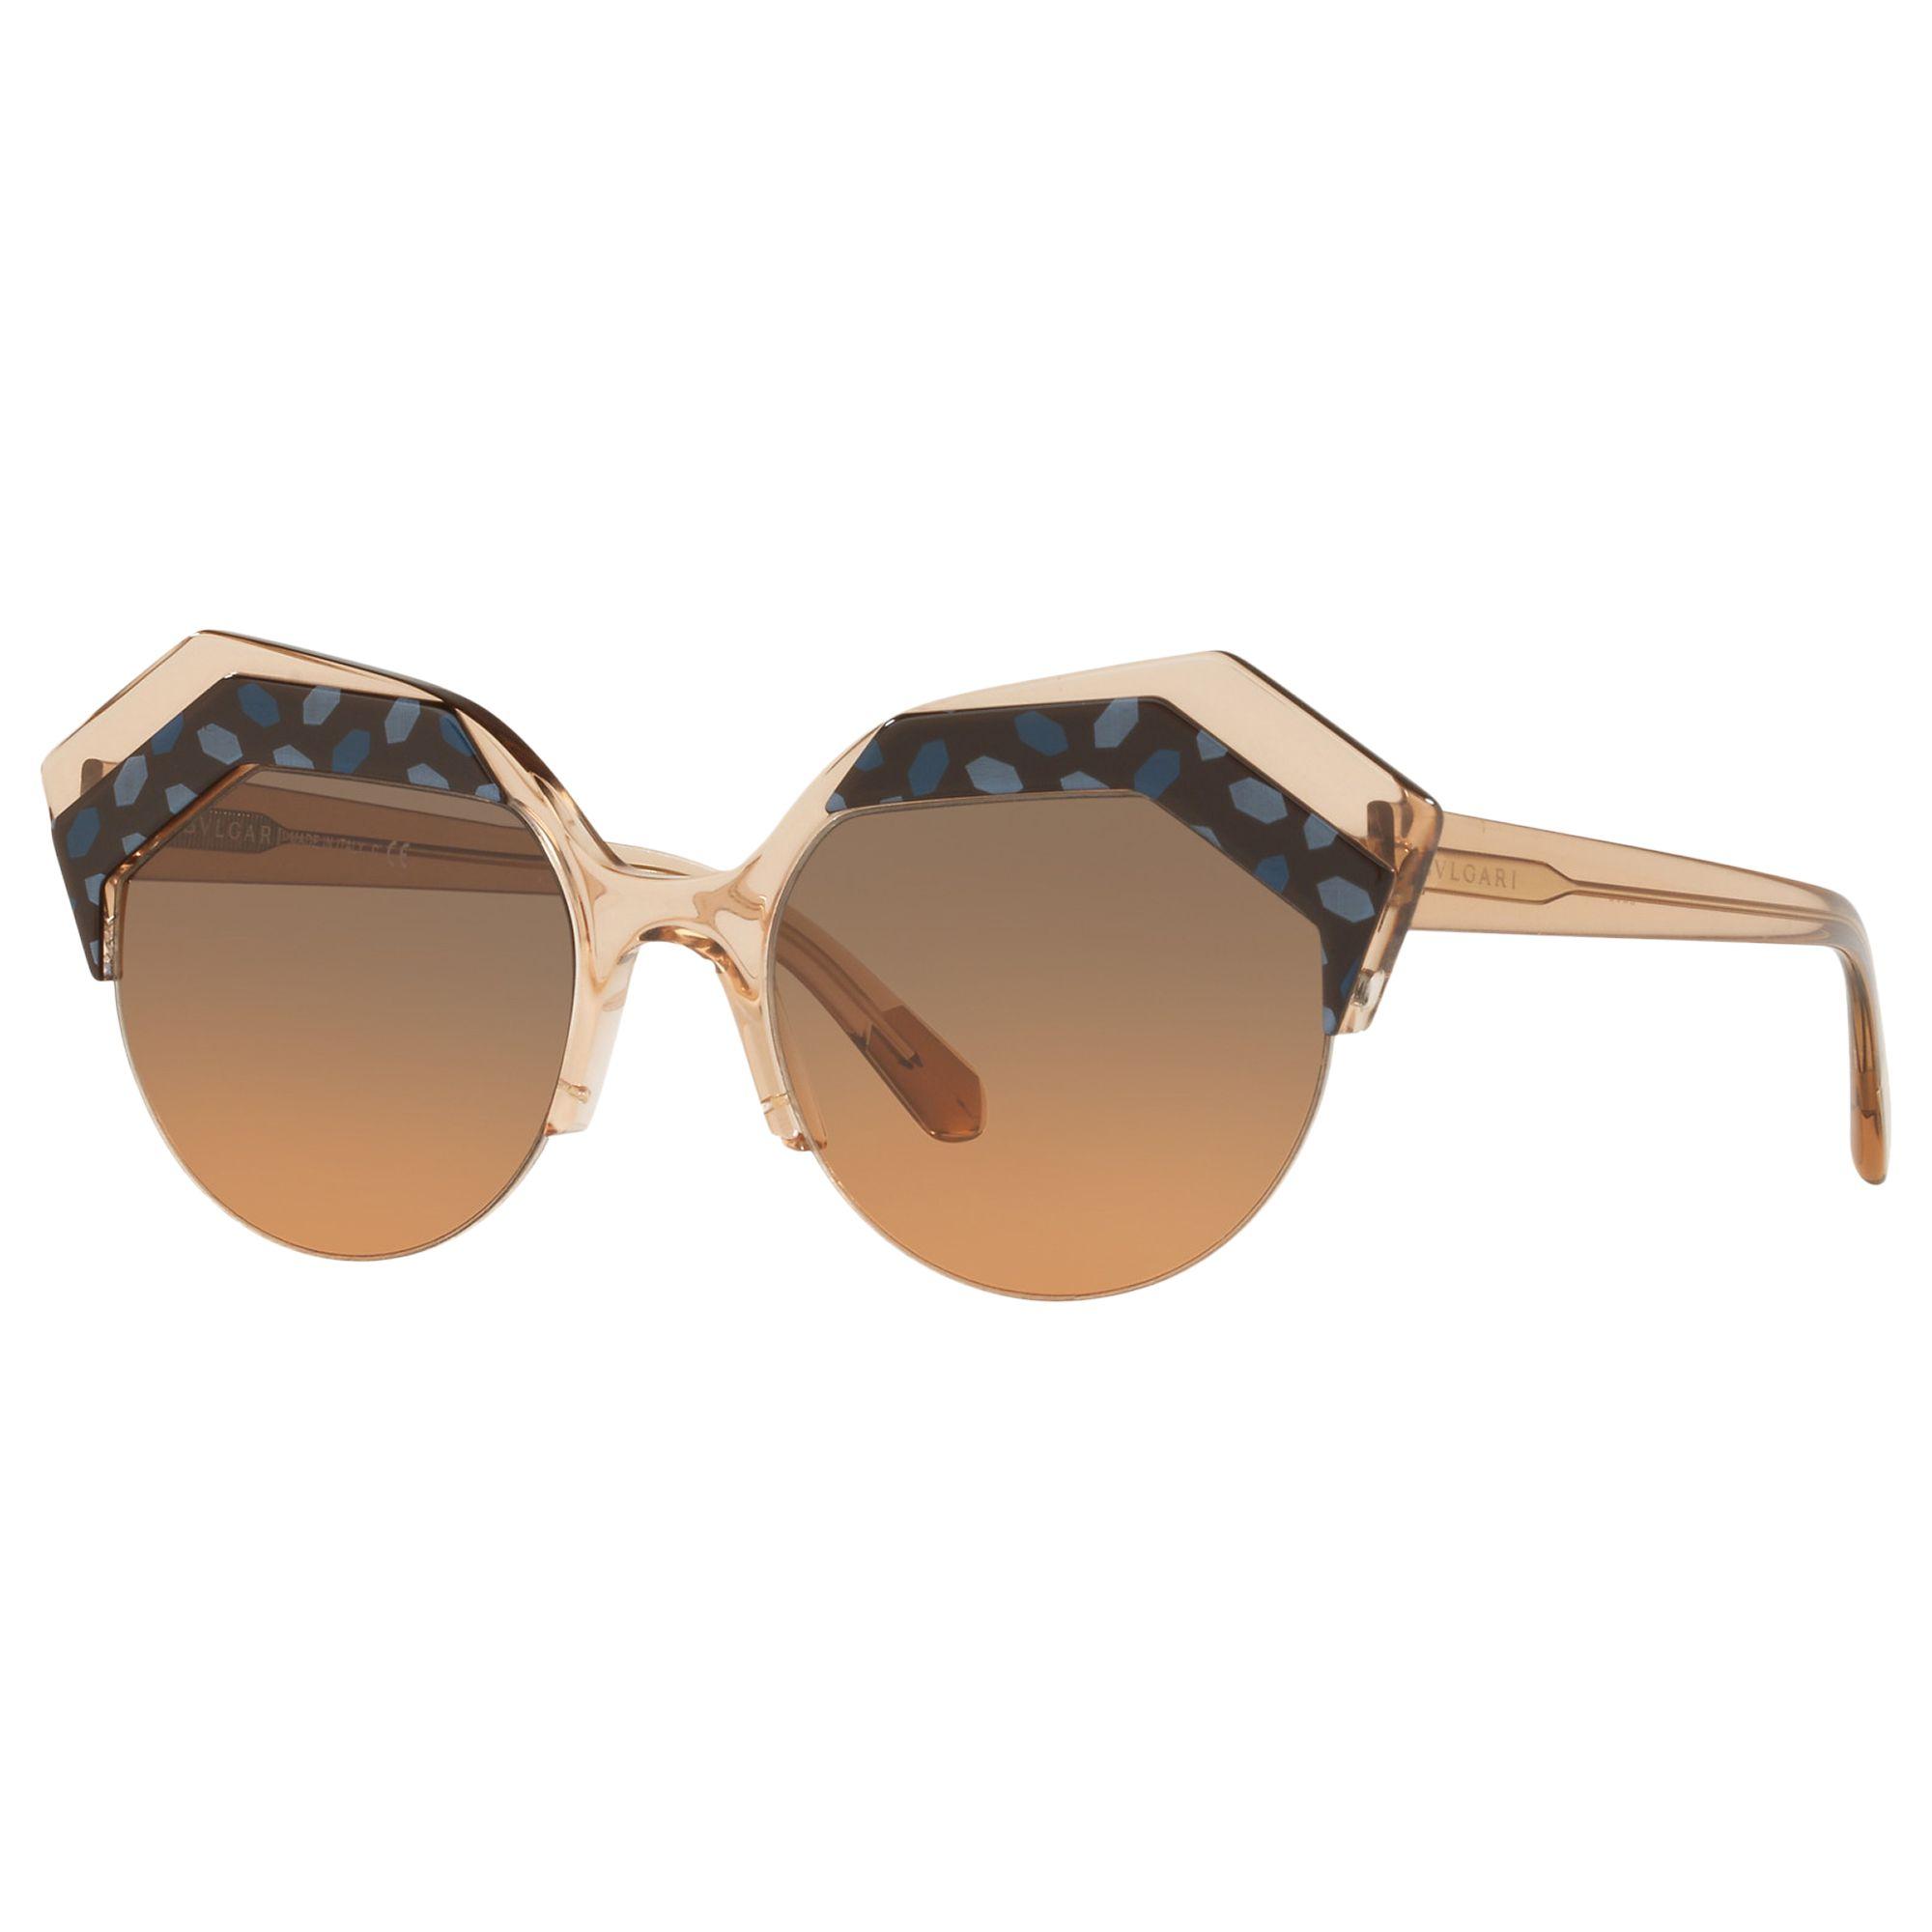 Bvlgari BVLGARI BV8203 Women's Embellished Round Sunglasses, Camel/Brown Gradient